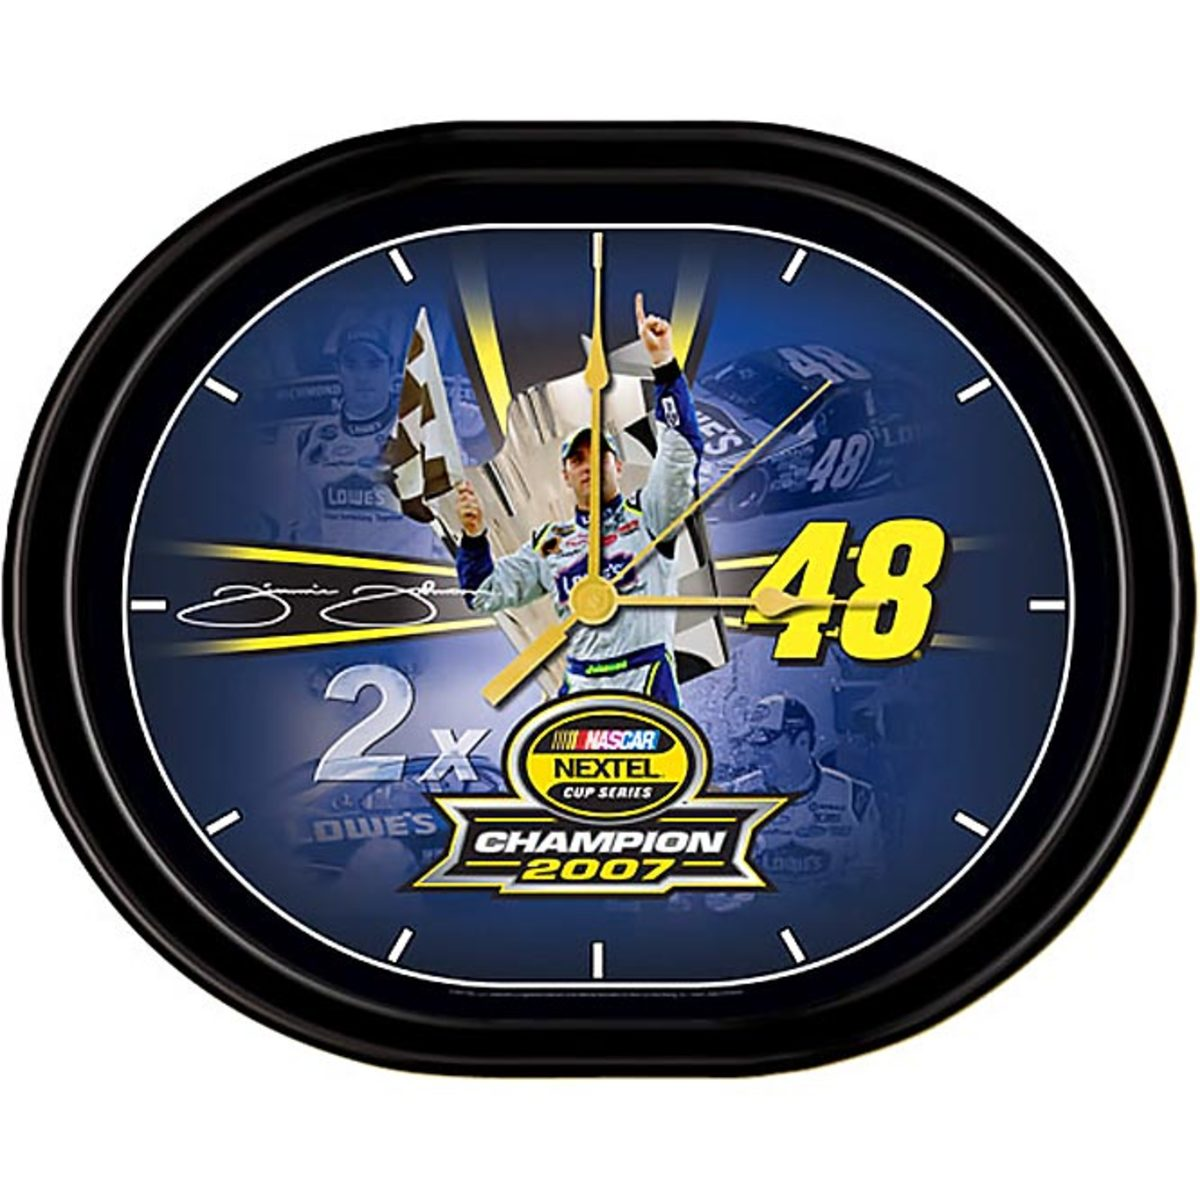 Jimmie Johnson '07 Back to Back Champion JEBCO Clock